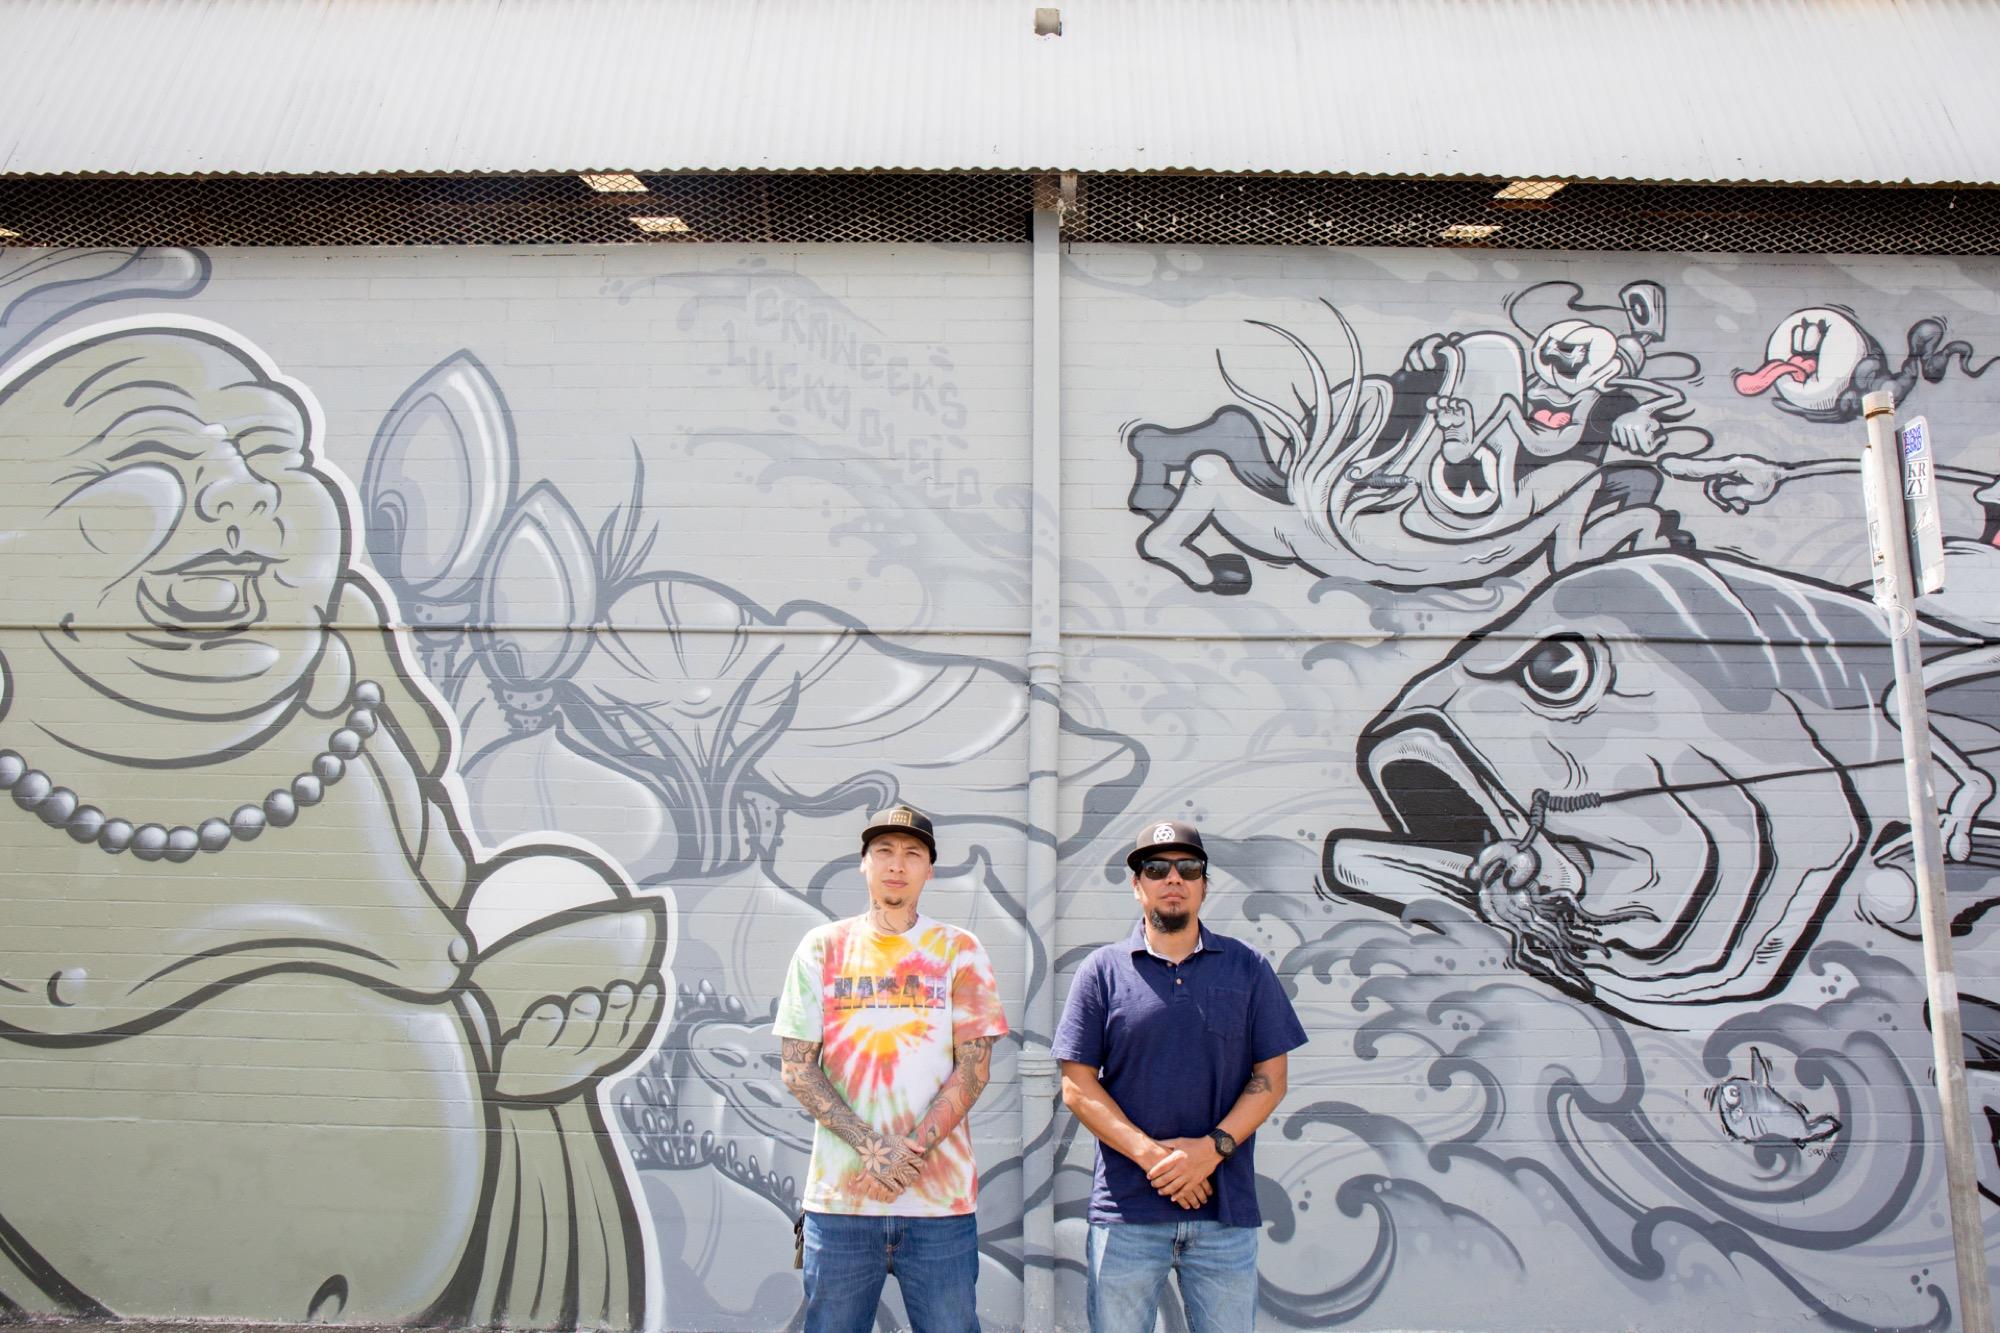 Recap: POW! WOW! Hawaii 2019 Artes & contextos pwh2019 LuckyOlelo Ckaweeks lannycatcheswalls